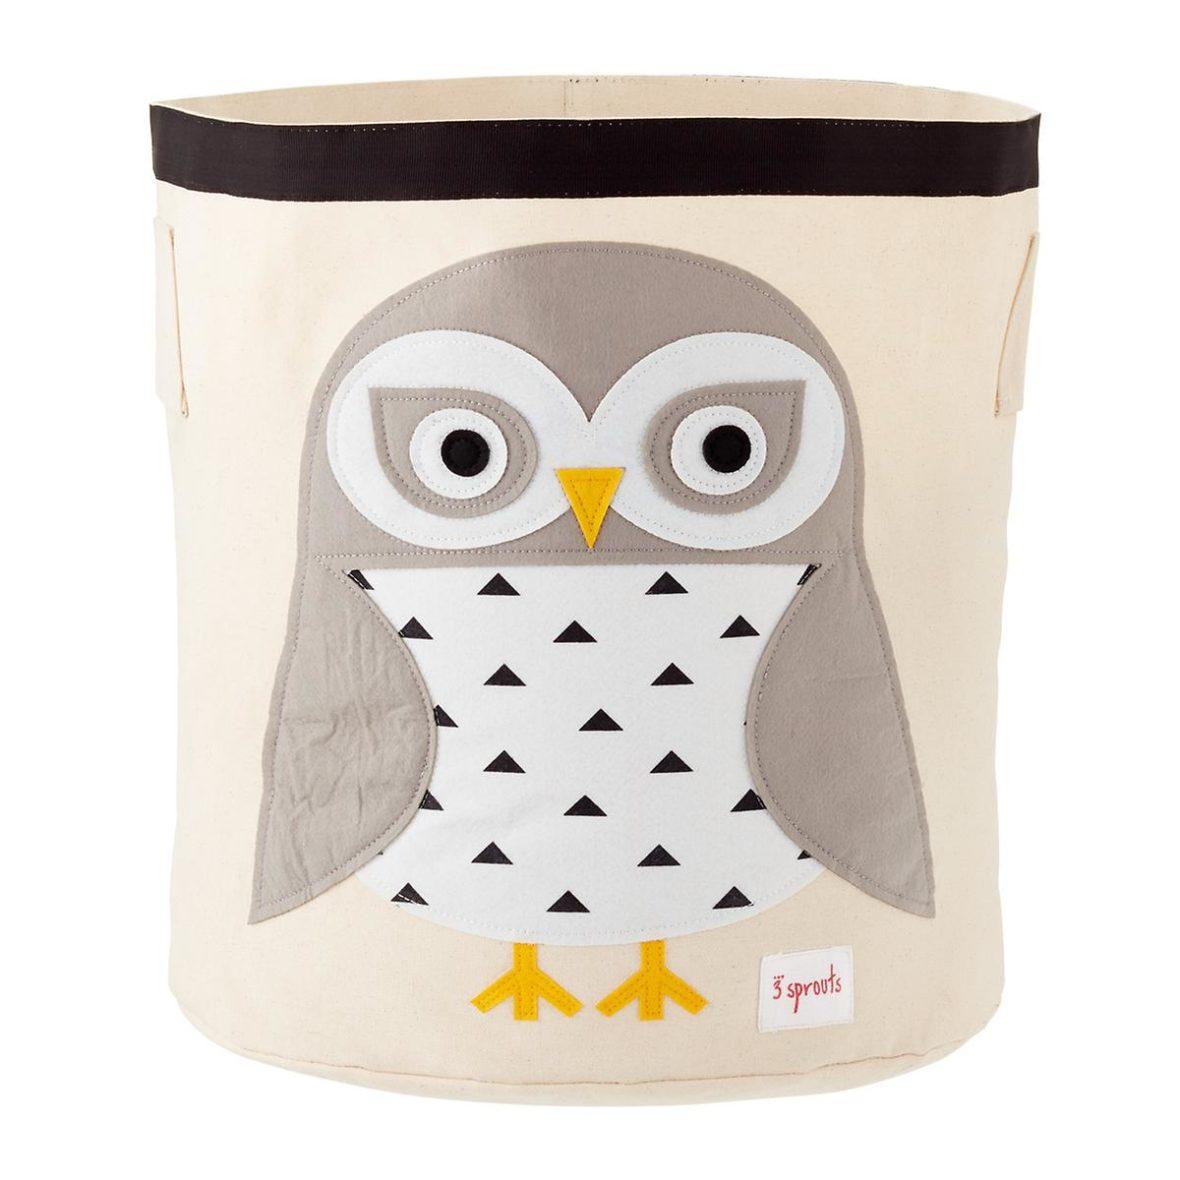 3 Sprouts Καλάθι παιχνιδιών Storage binSnowy Owl